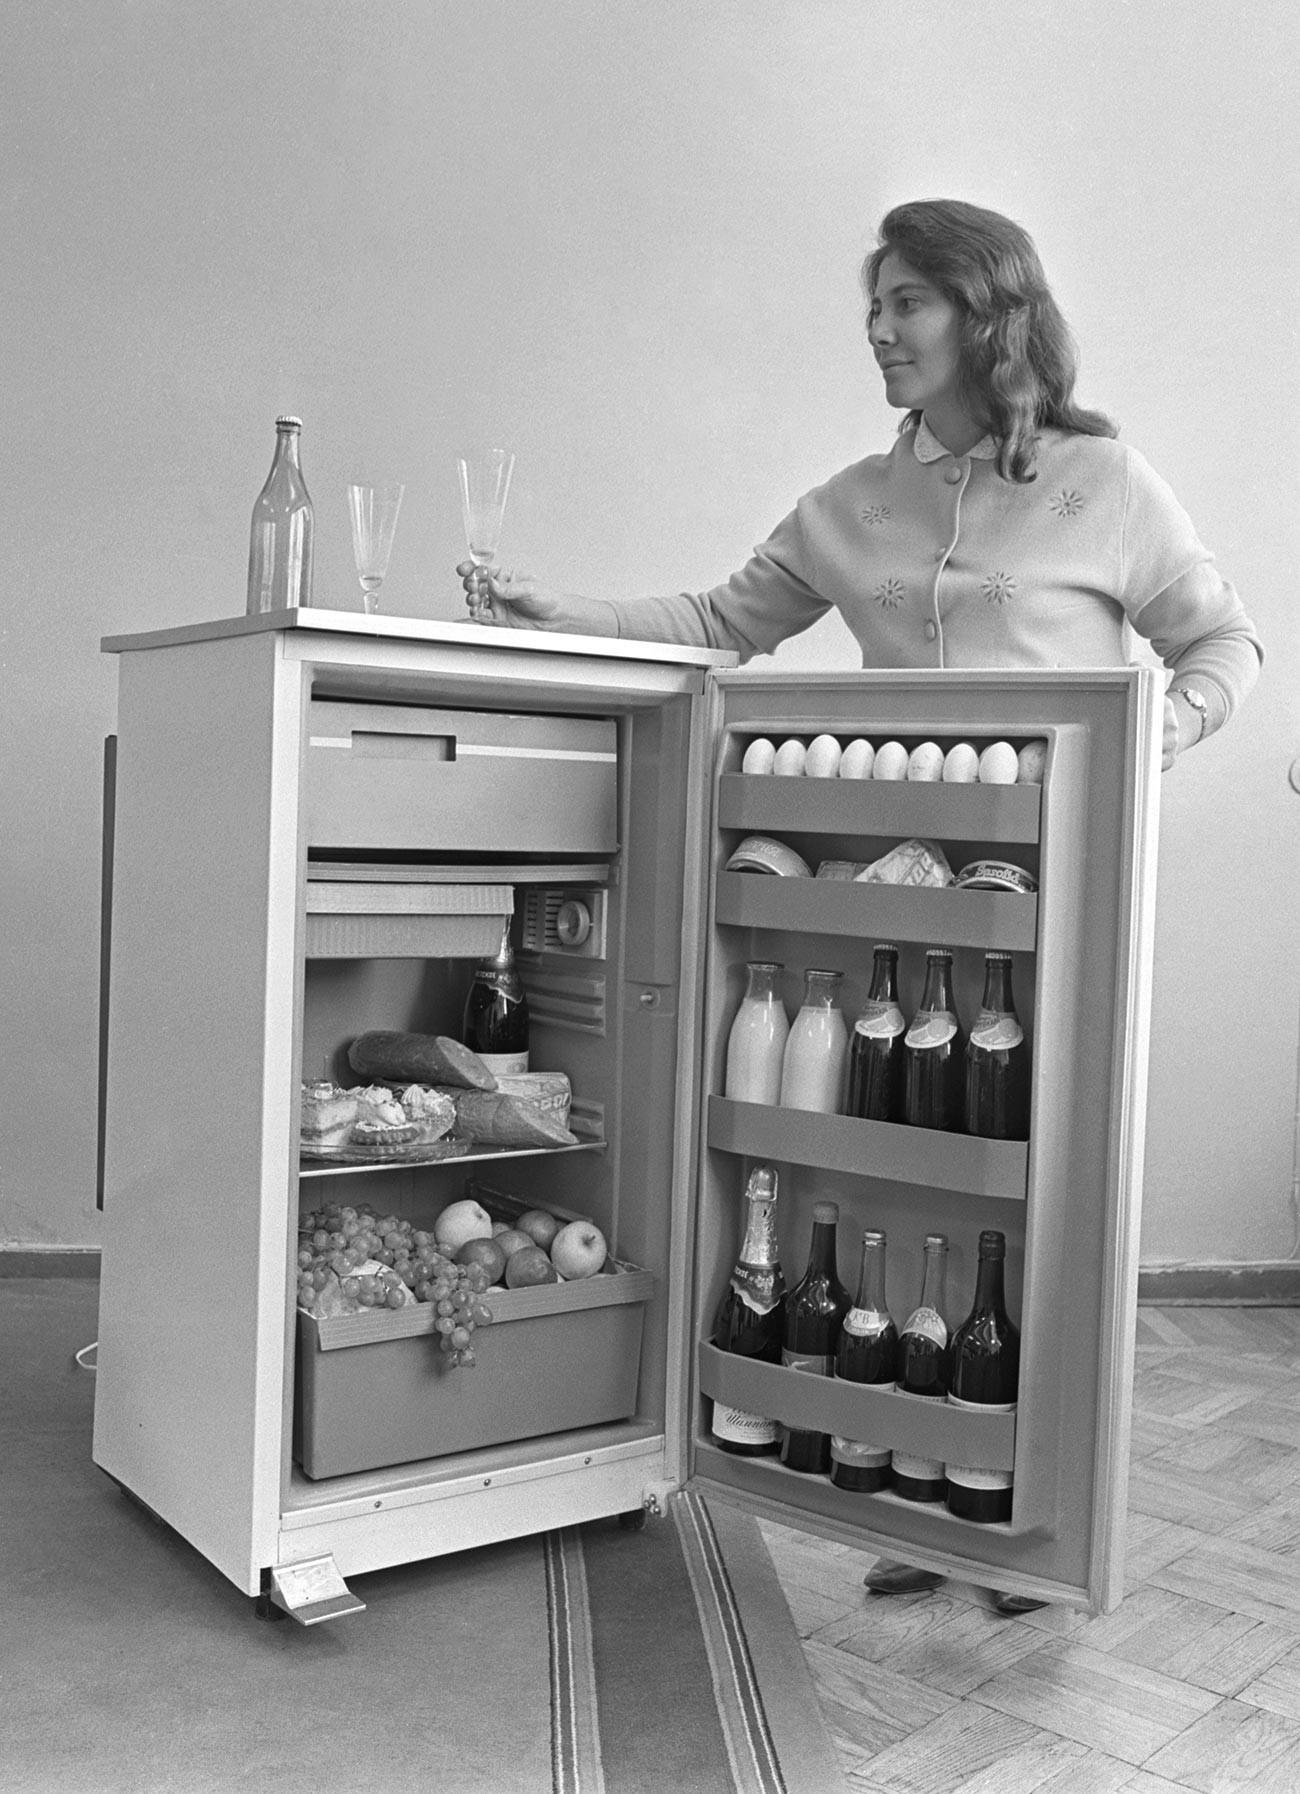 Кишиневска фабрика за фрижидери, 1970 година.